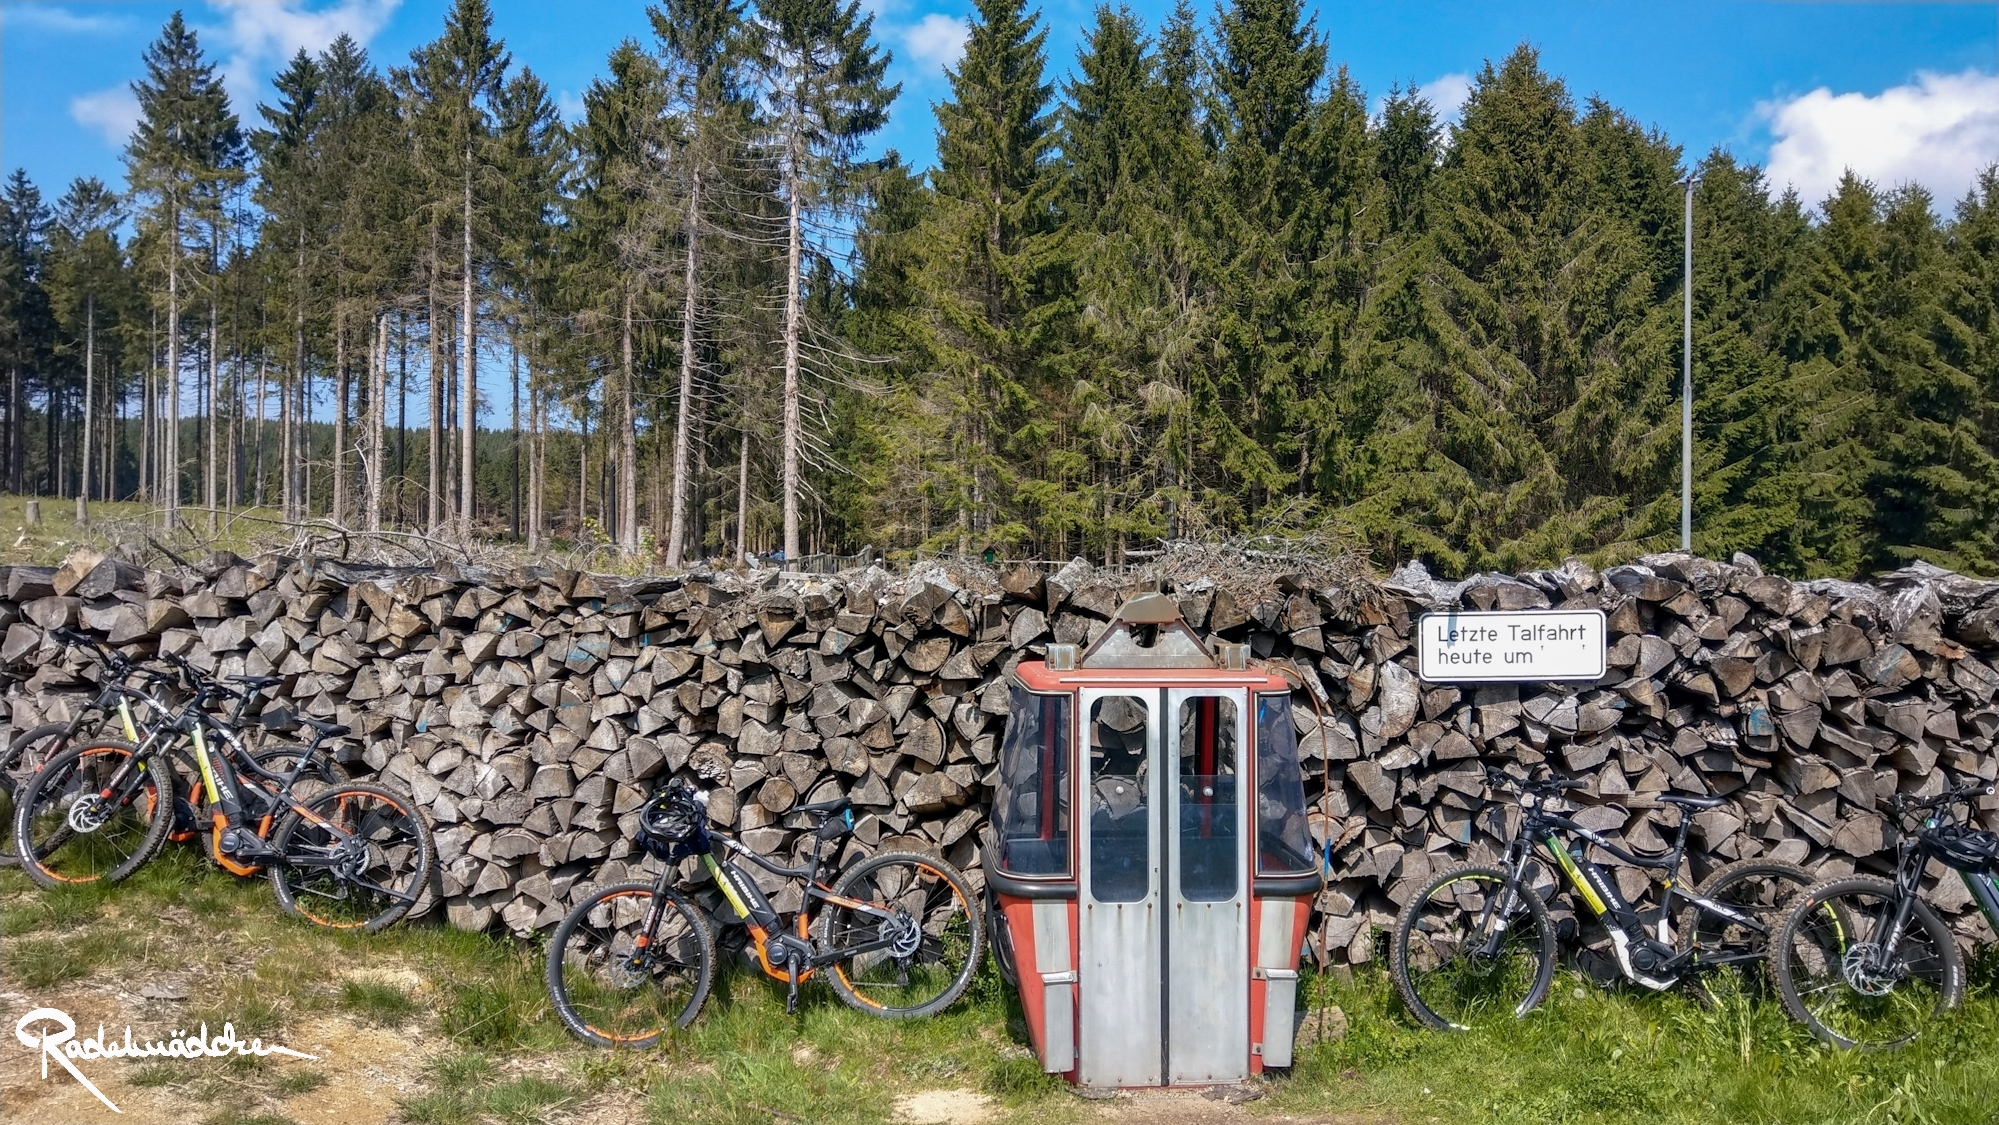 E-MTB-Mountainbike-Harz-Wernigerode-ebike-your-life_Radelmaedchen_Juliane-S-35